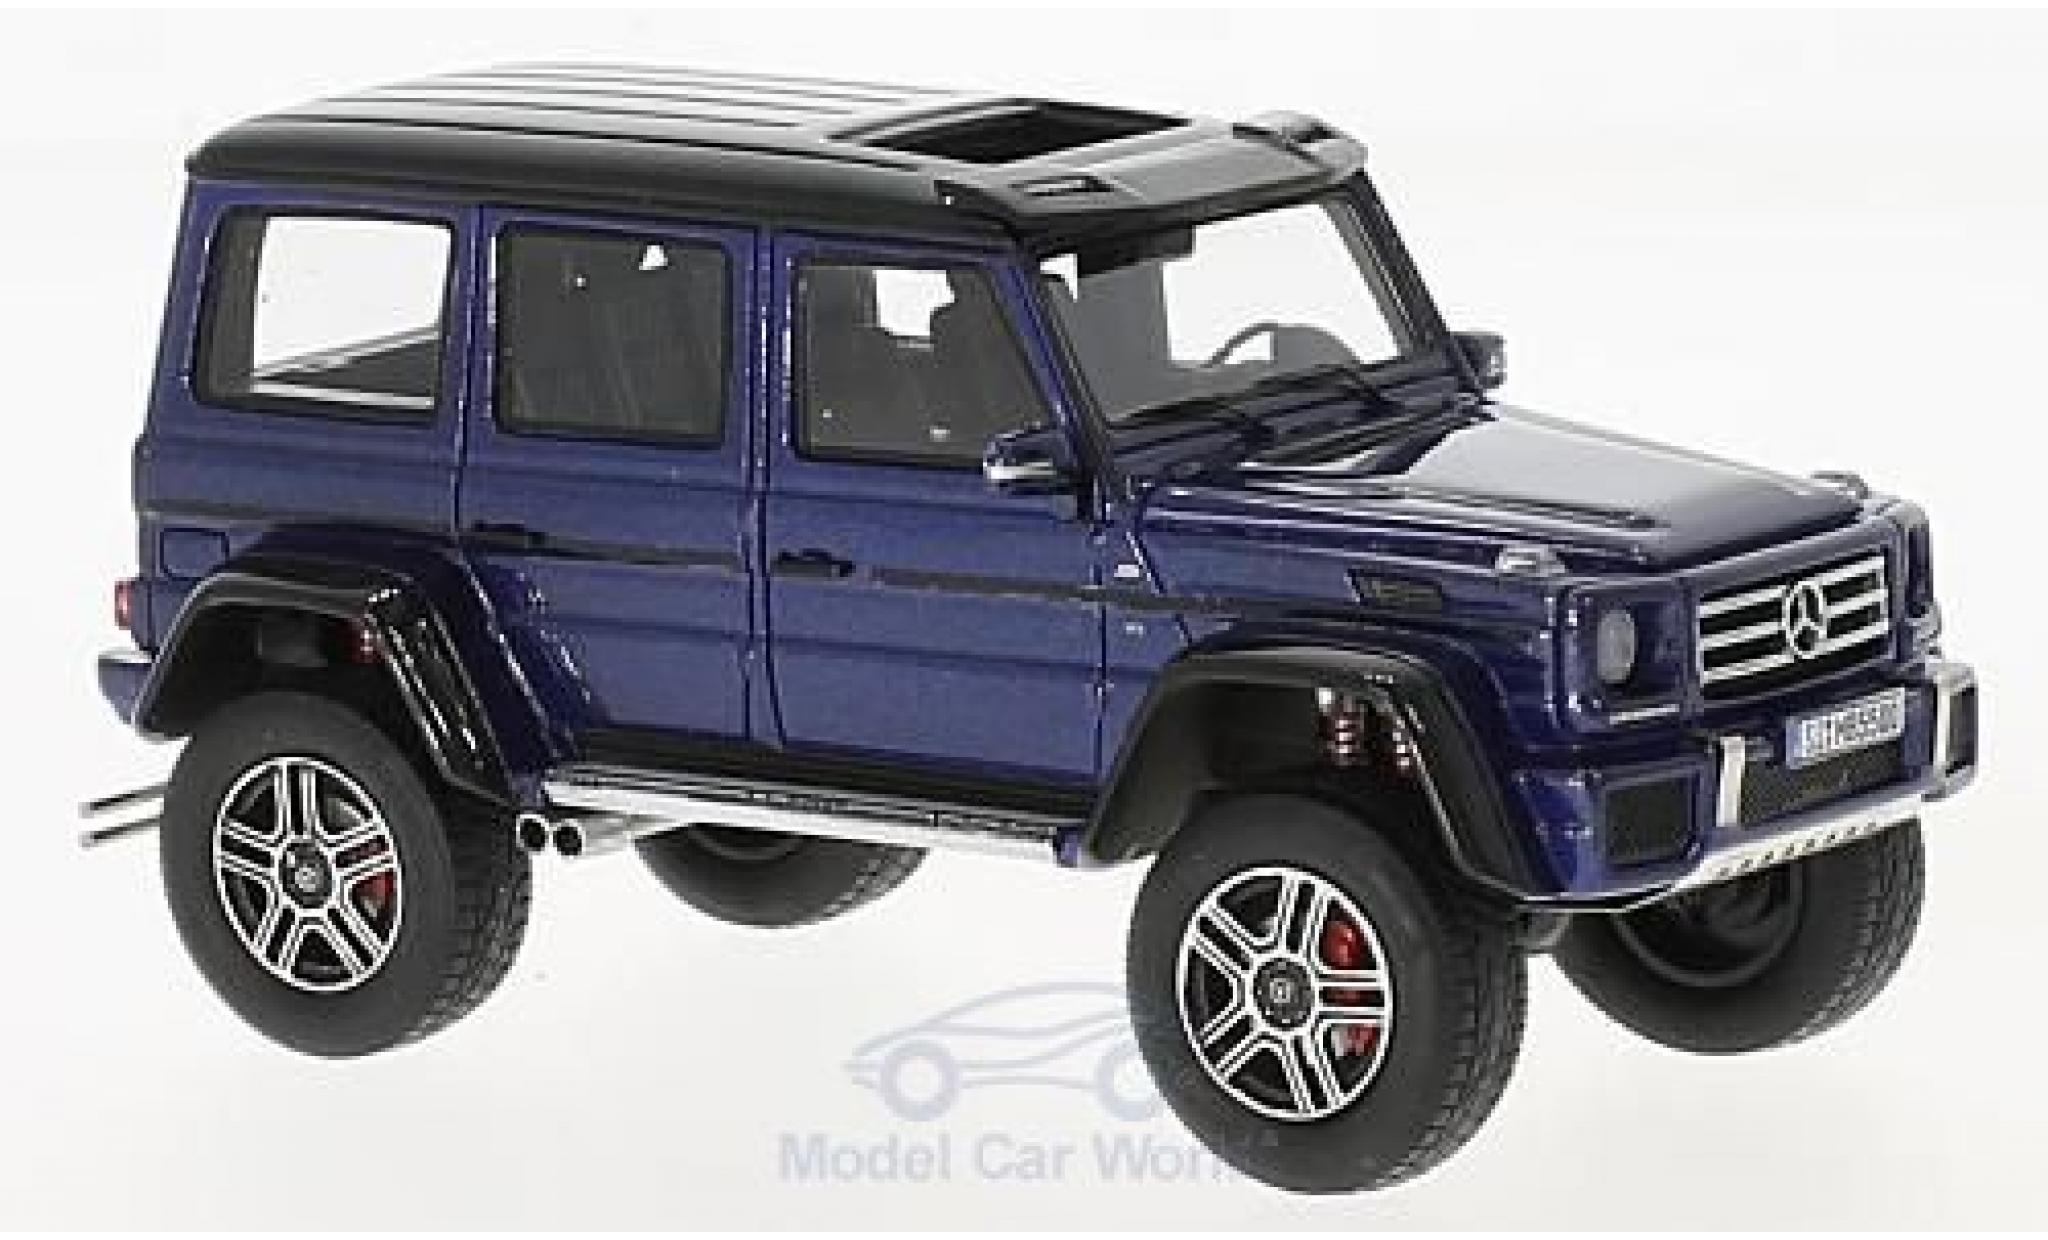 Diecast Model Cars Mercedes Classe G 1 43 Glm G550 4x4 Metallise Blue Black 2016 Alldiecast Co Uk